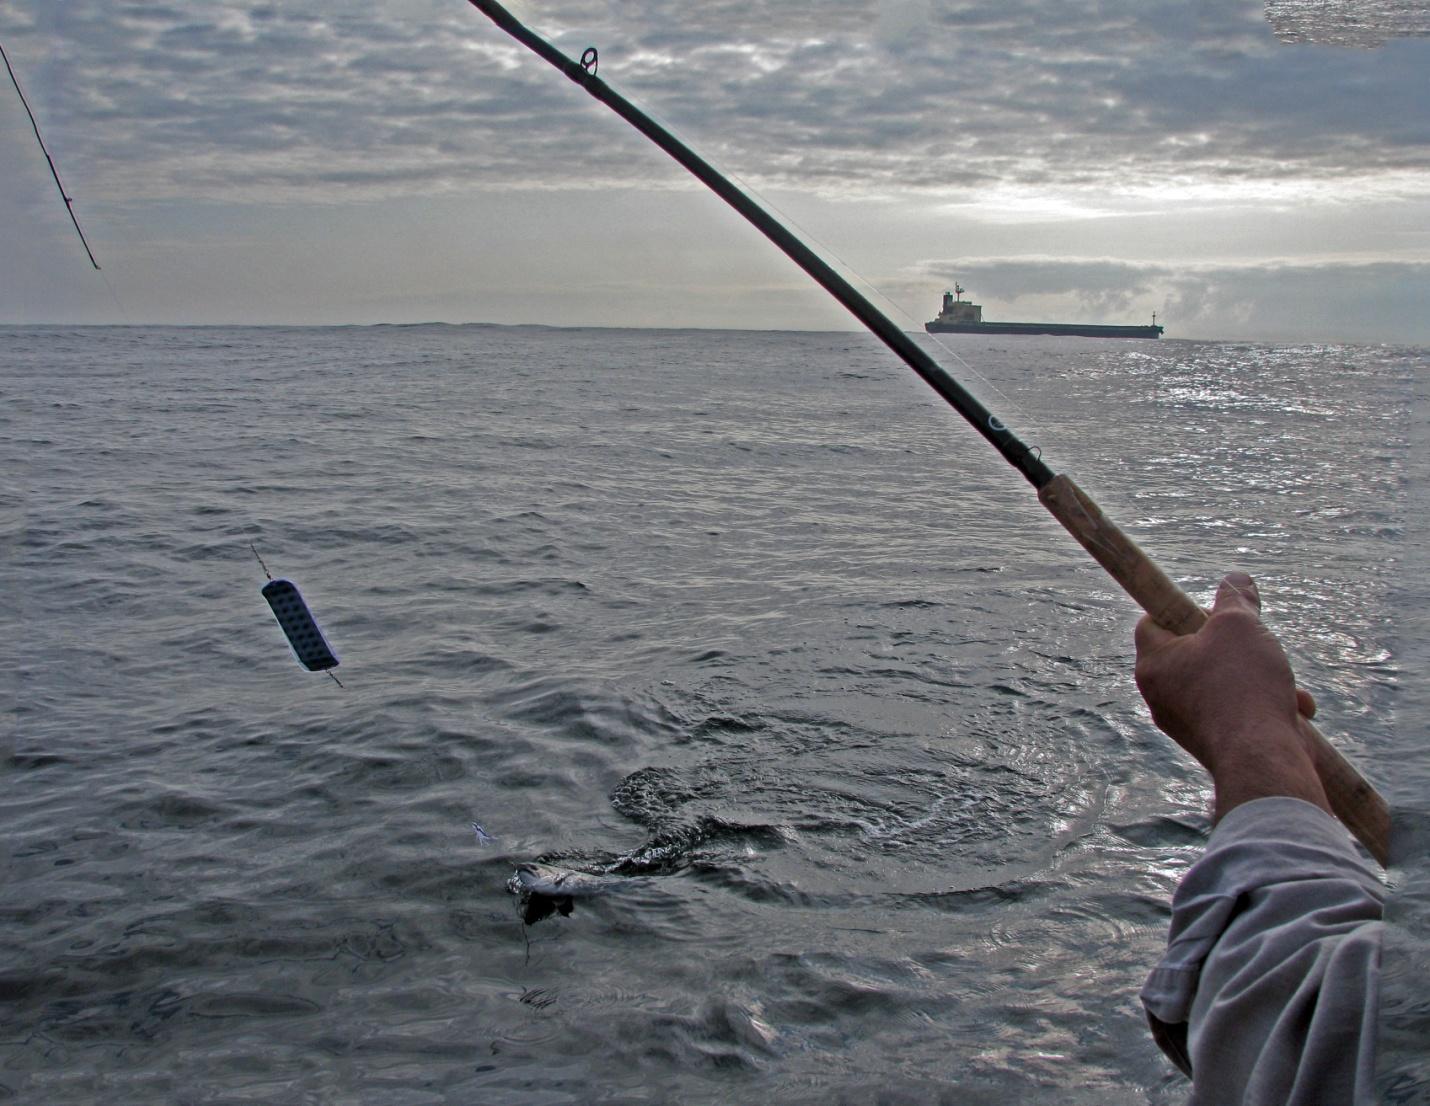 C:\Users\Russ\Desktop\Fishing\Fishing 030.jpg